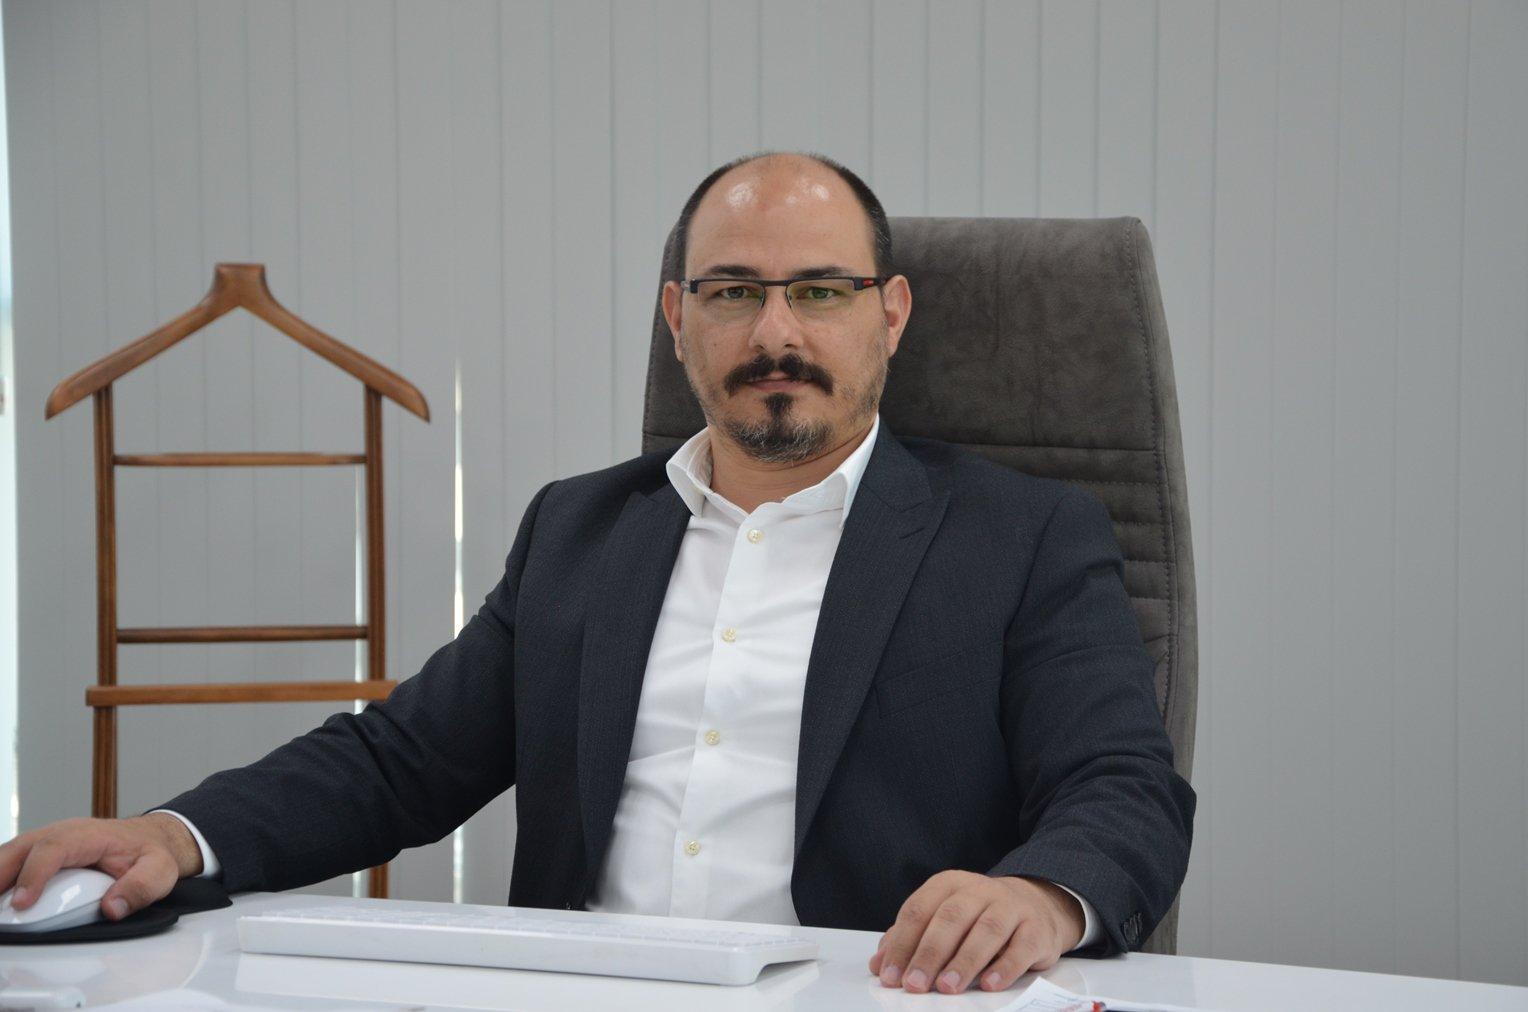 Malicous Websites Against Mr. Yusuf Kısa Removed